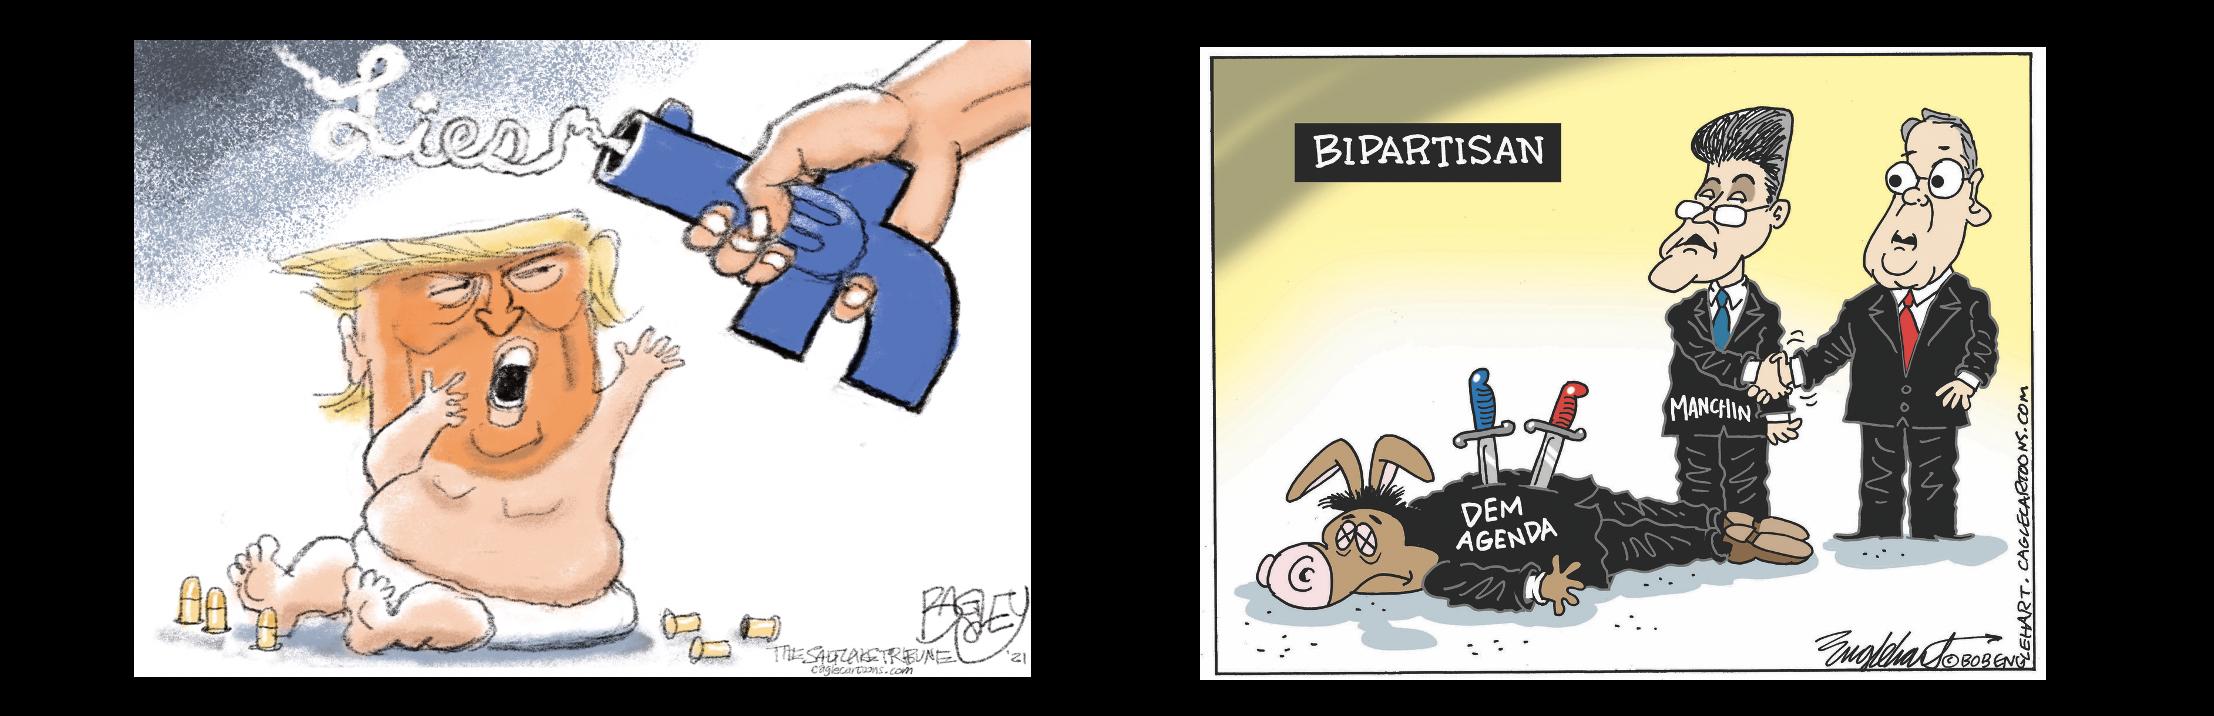 GOP Bipartisan Nonsense lampooned in Political Cartoons